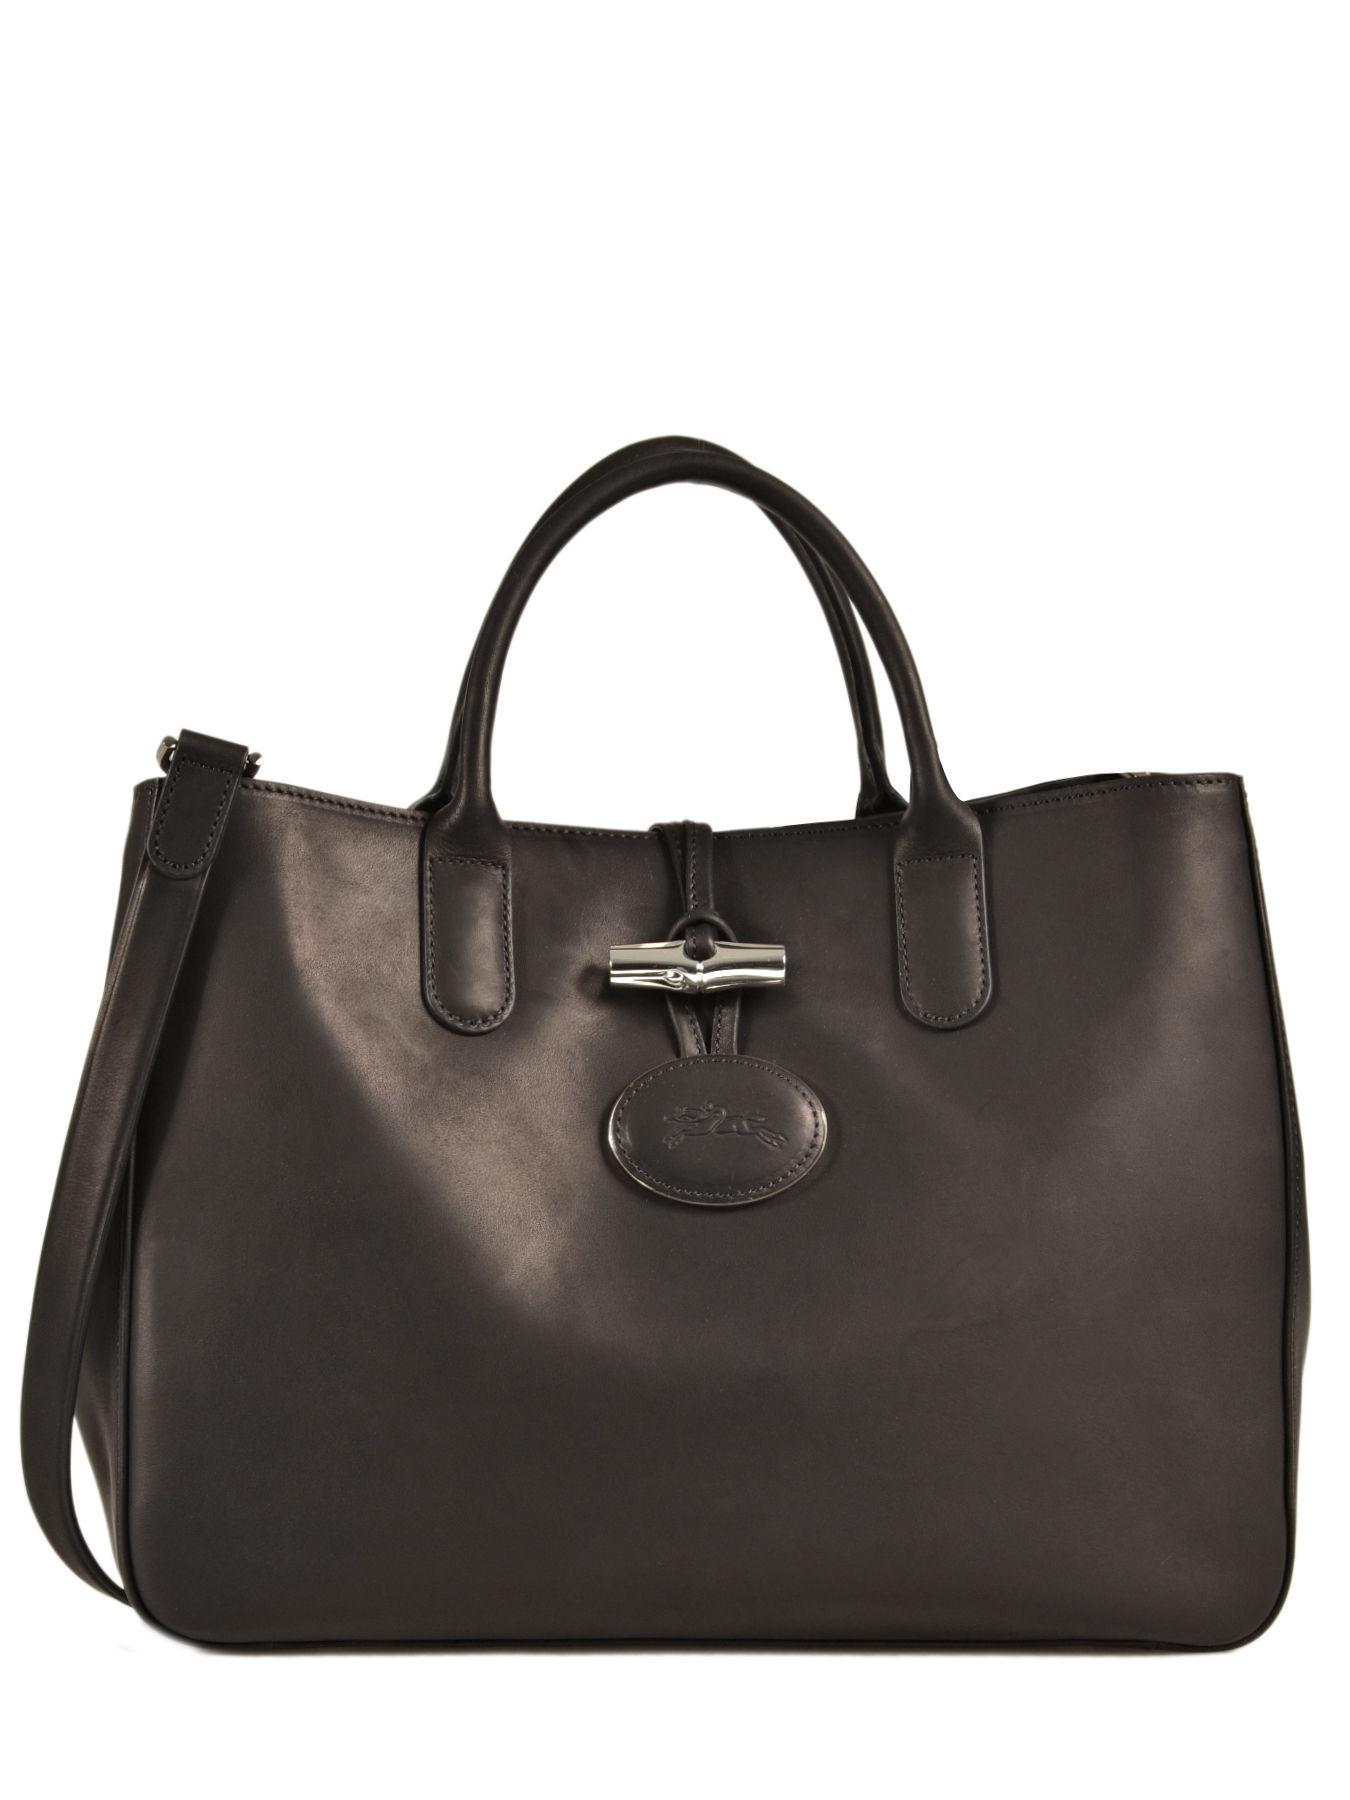 0d597c76725 Longchamp Handbag Black · Longchamp Handbag Black ...